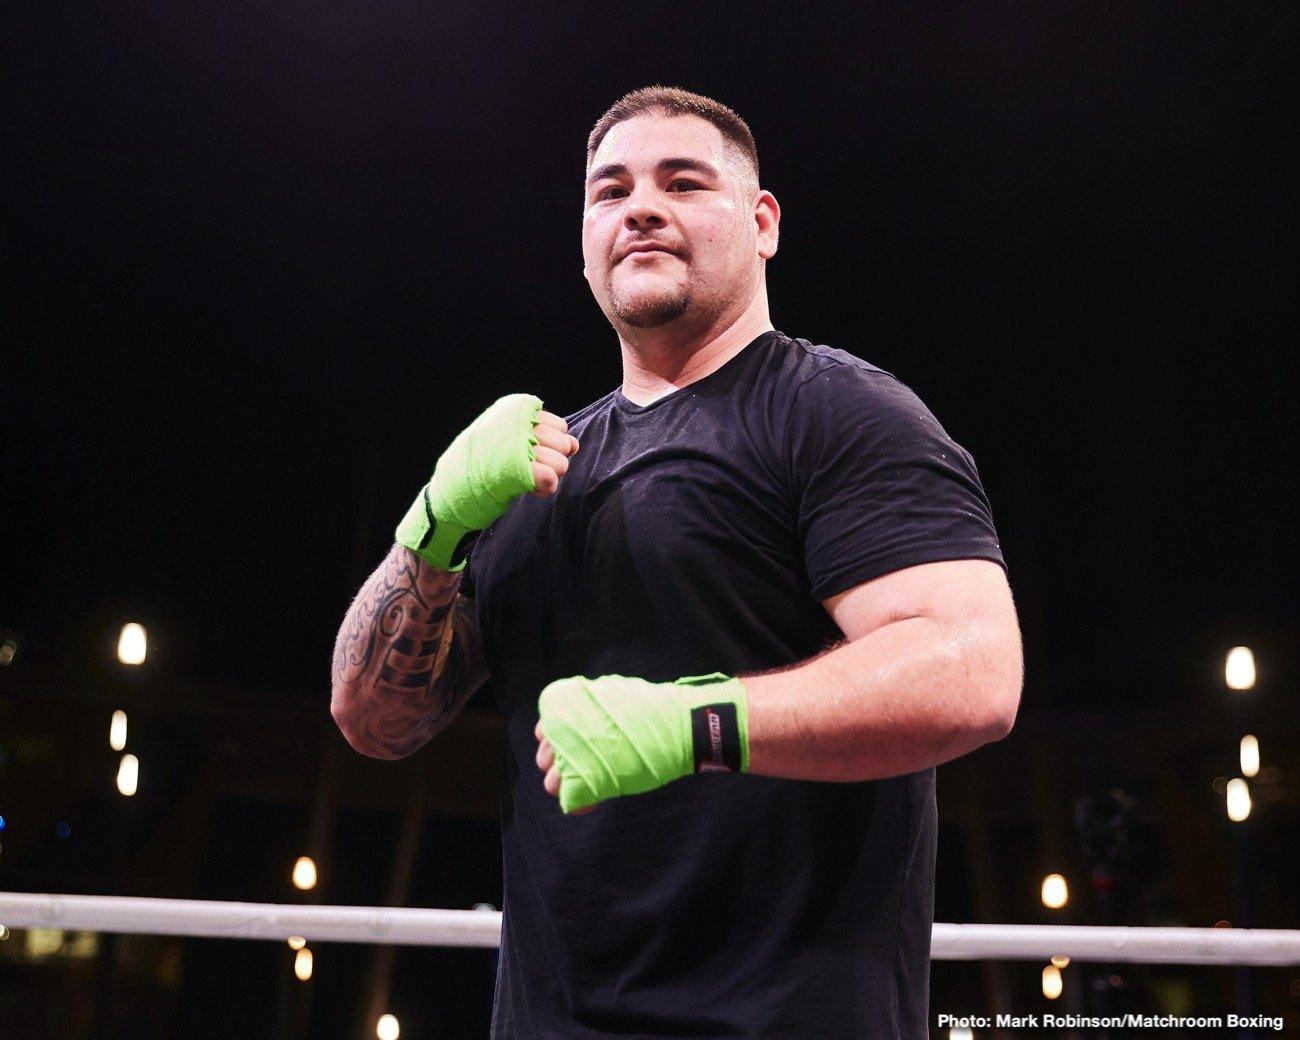 Tyson Fury Andy Ruiz Dillian Whyte Eddie Hearn Matchroom Boxing